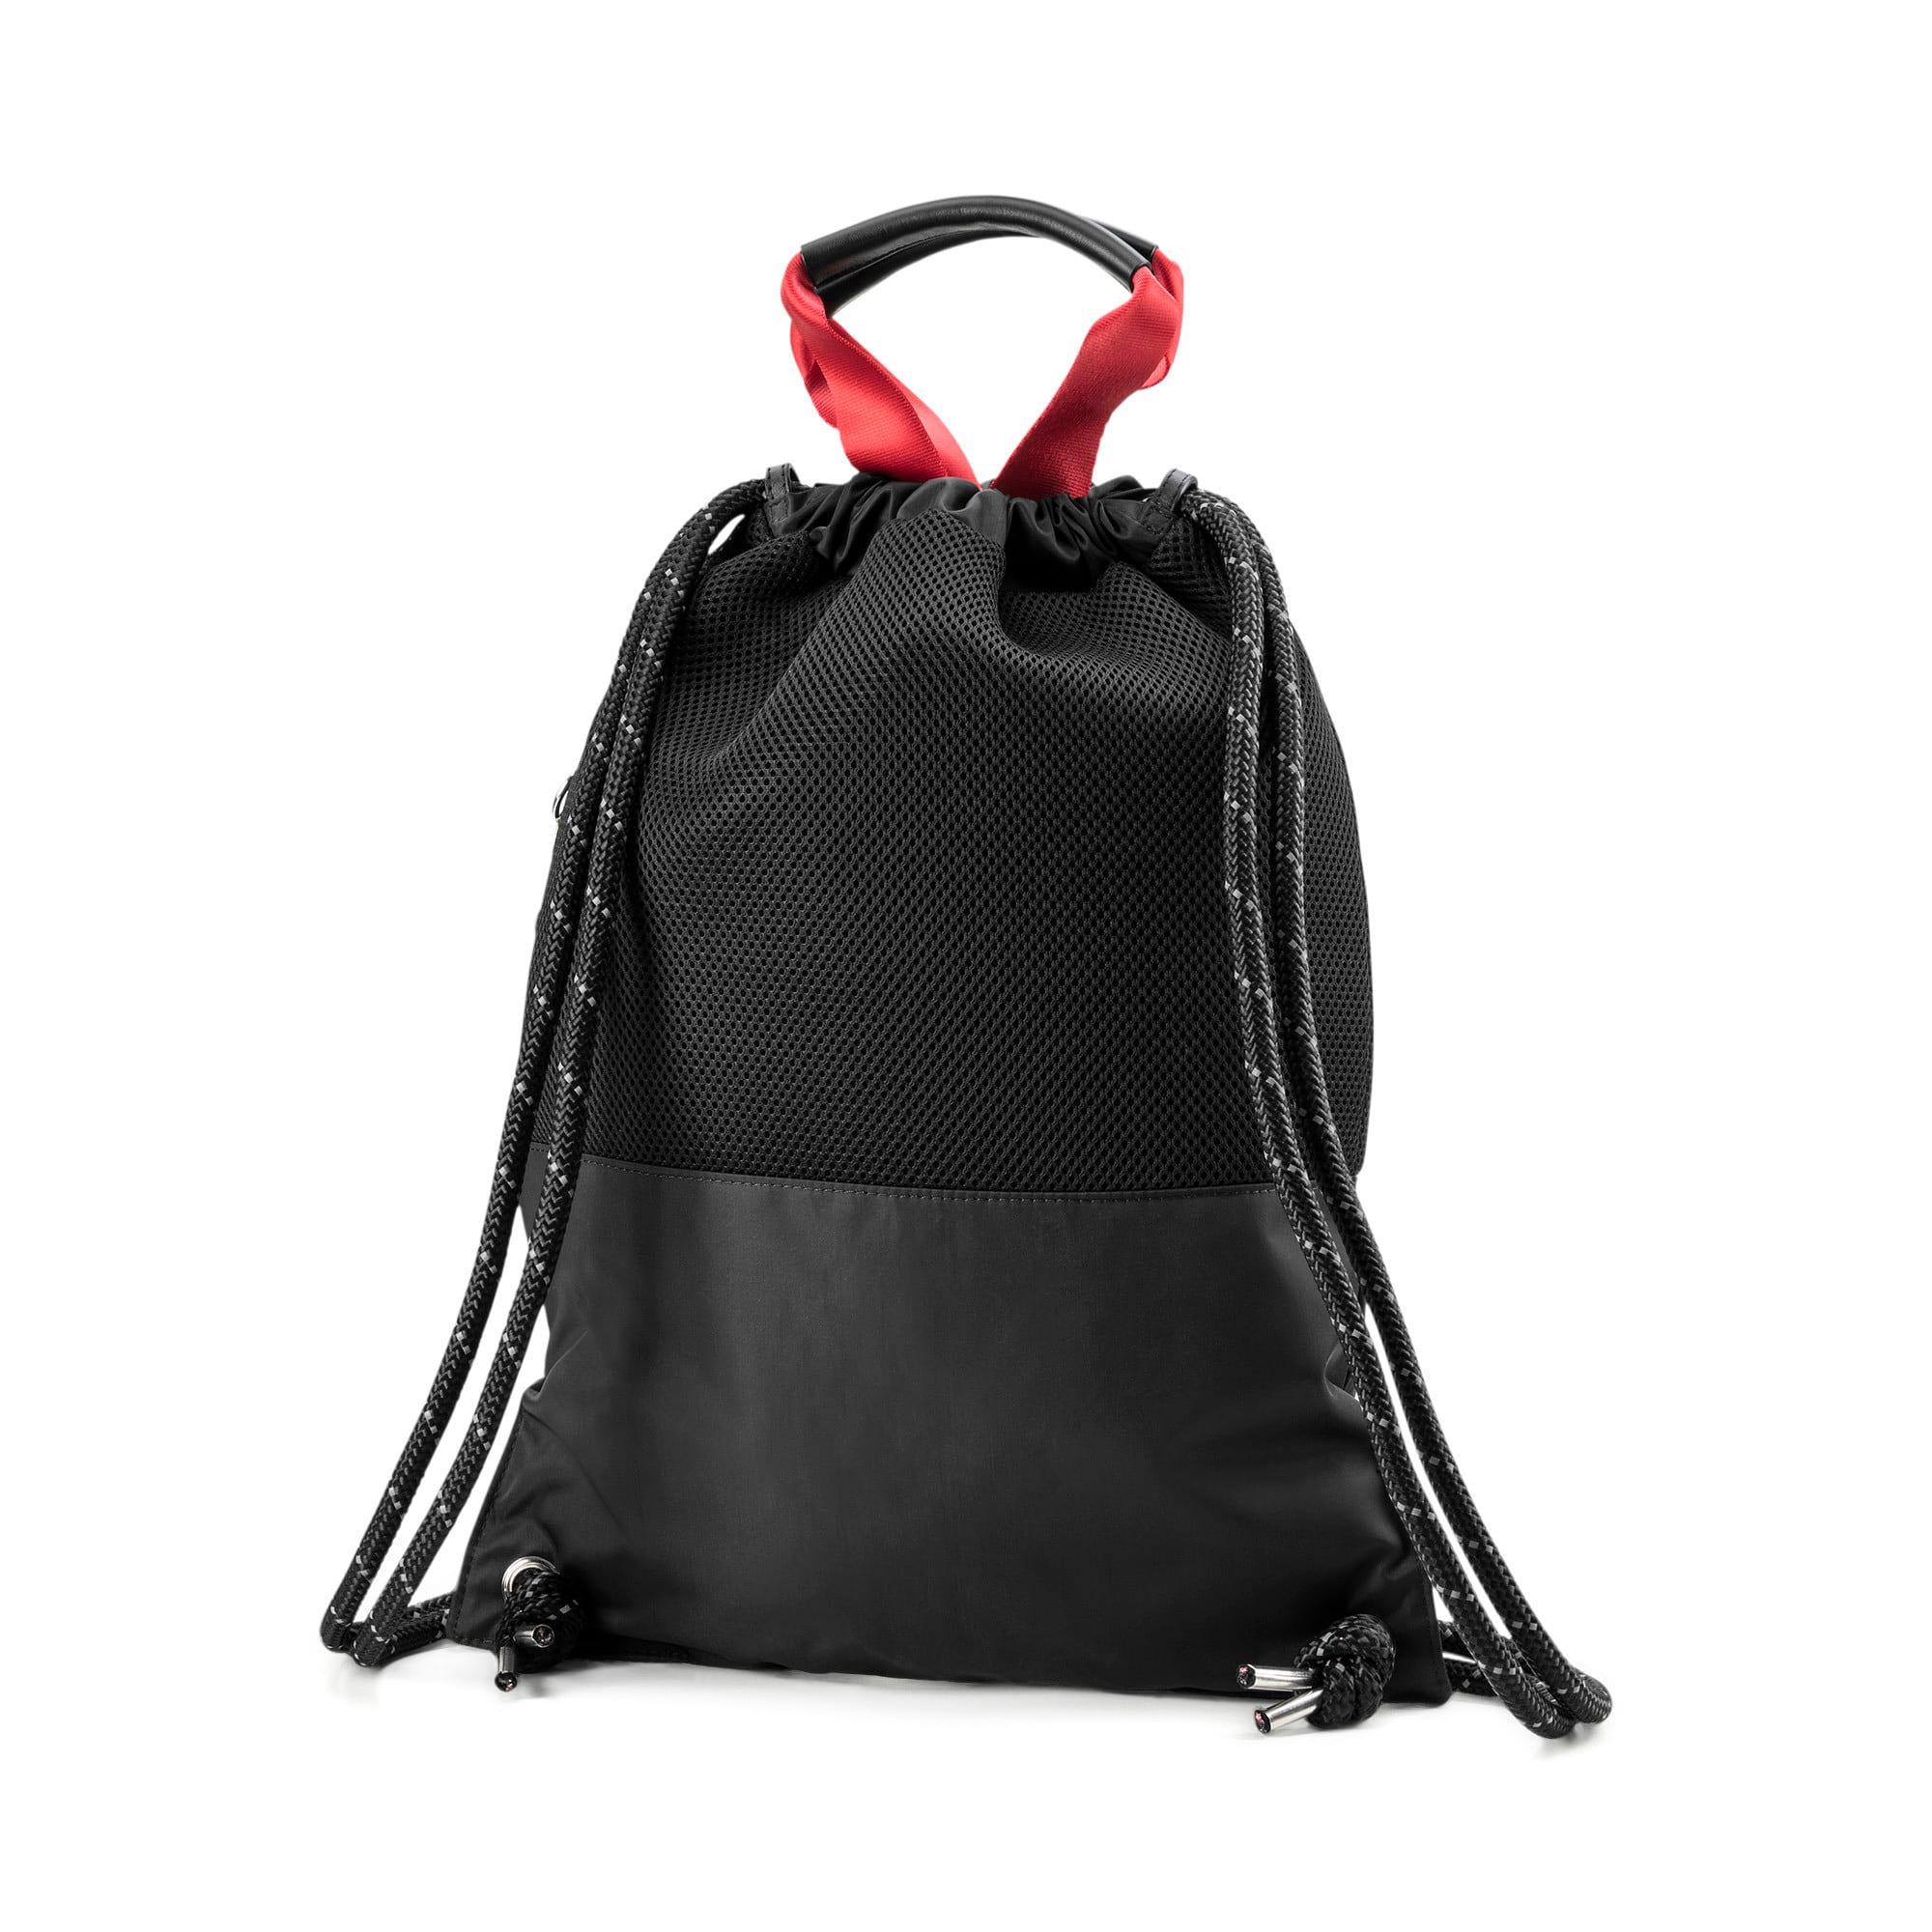 Thumbnail 4 of PUMA x KARL LAGERFELD Backpack Tote, Puma Black, medium